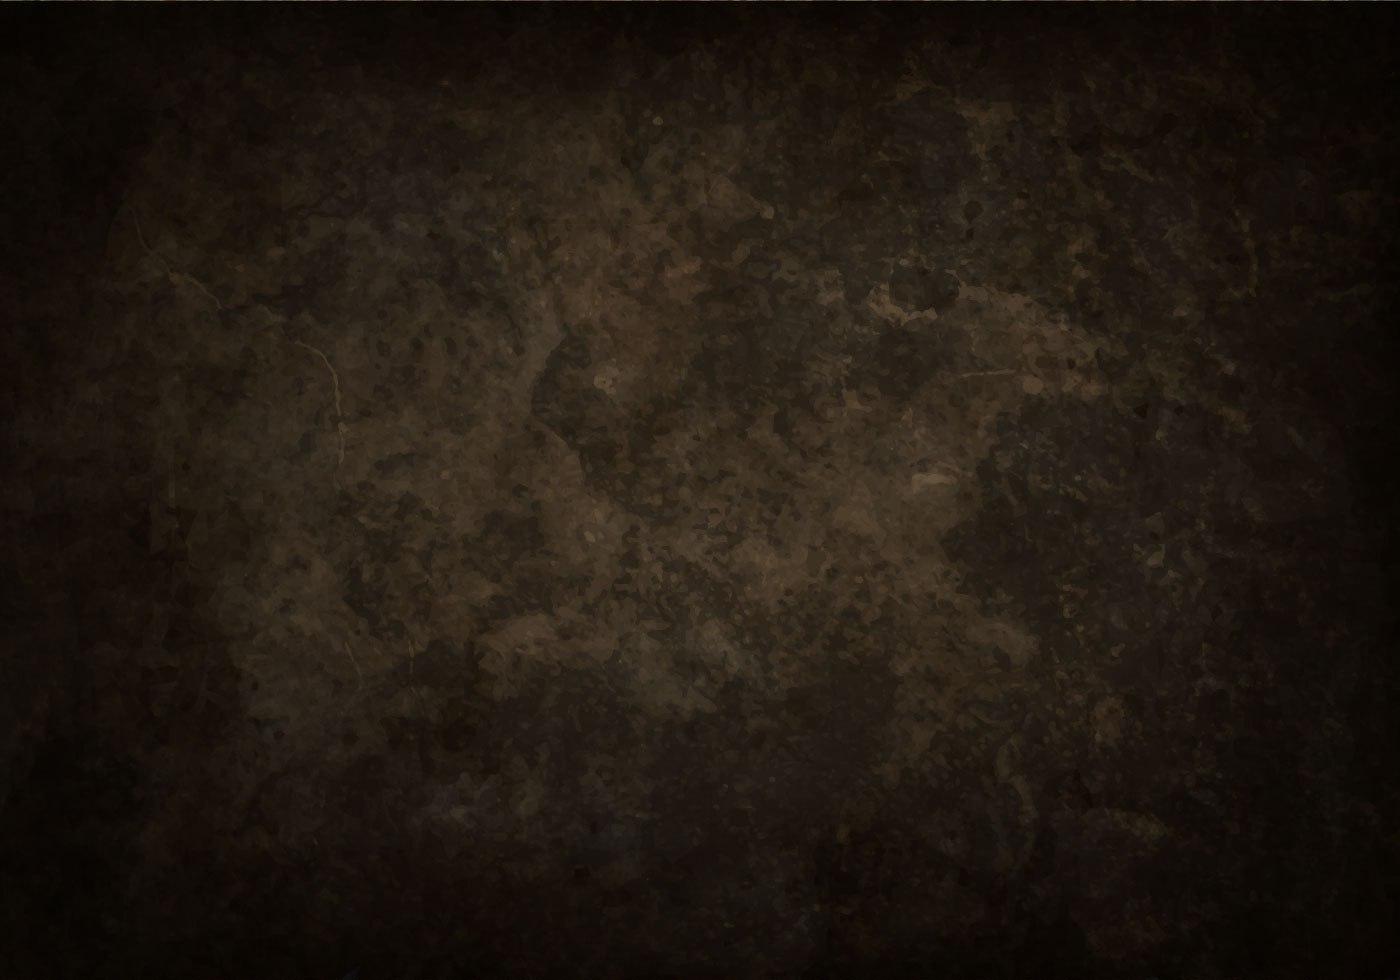 Free Vector Dark Grunge Texture - Download Free Vector Art ...